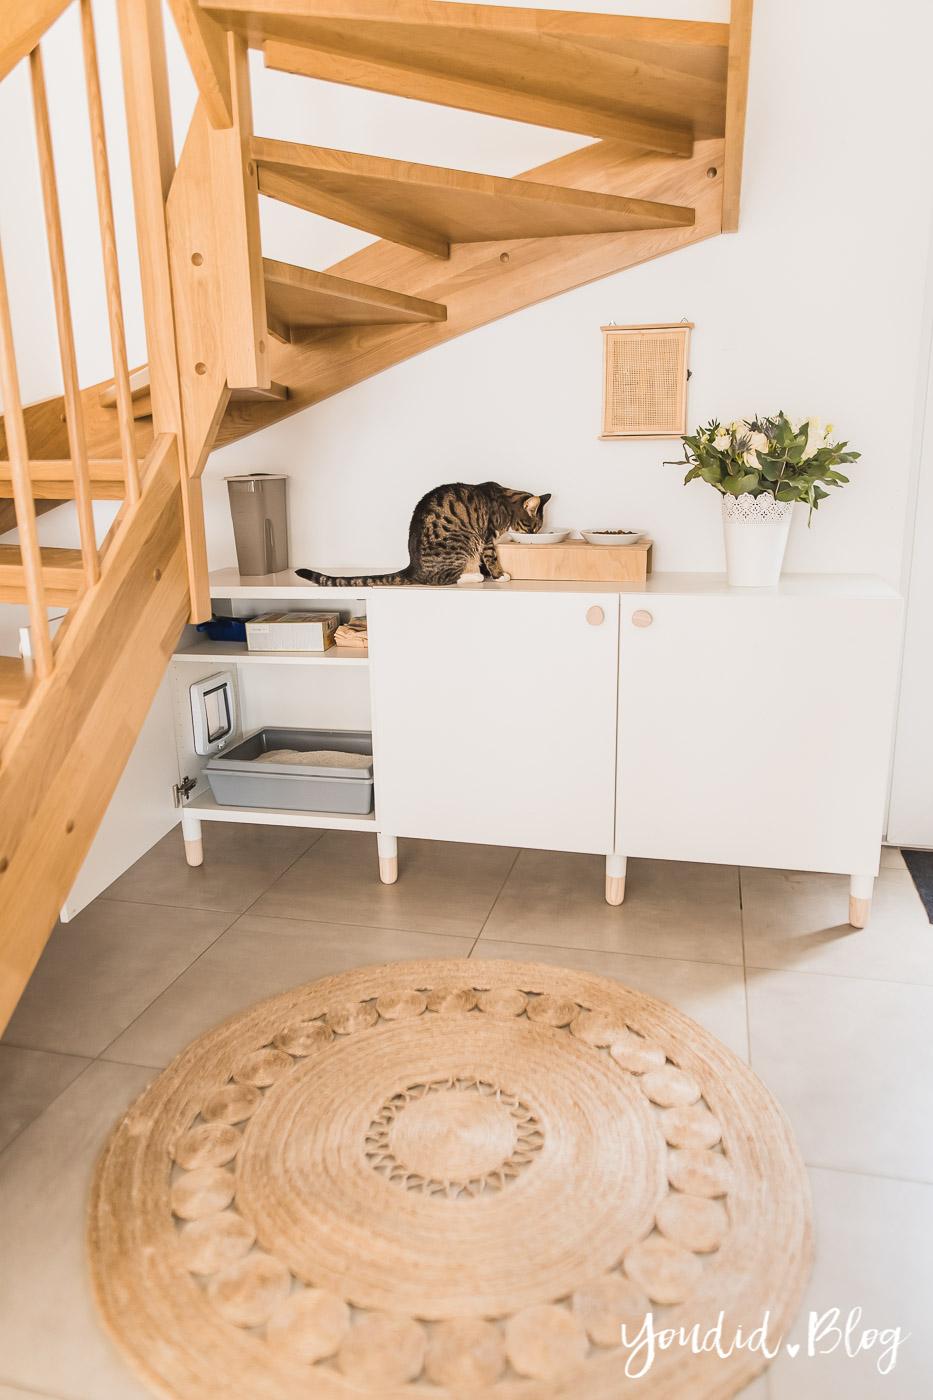 DIY Katzenklo in einem IKEA Besta Schrank verstecken   IKEA Hack ...